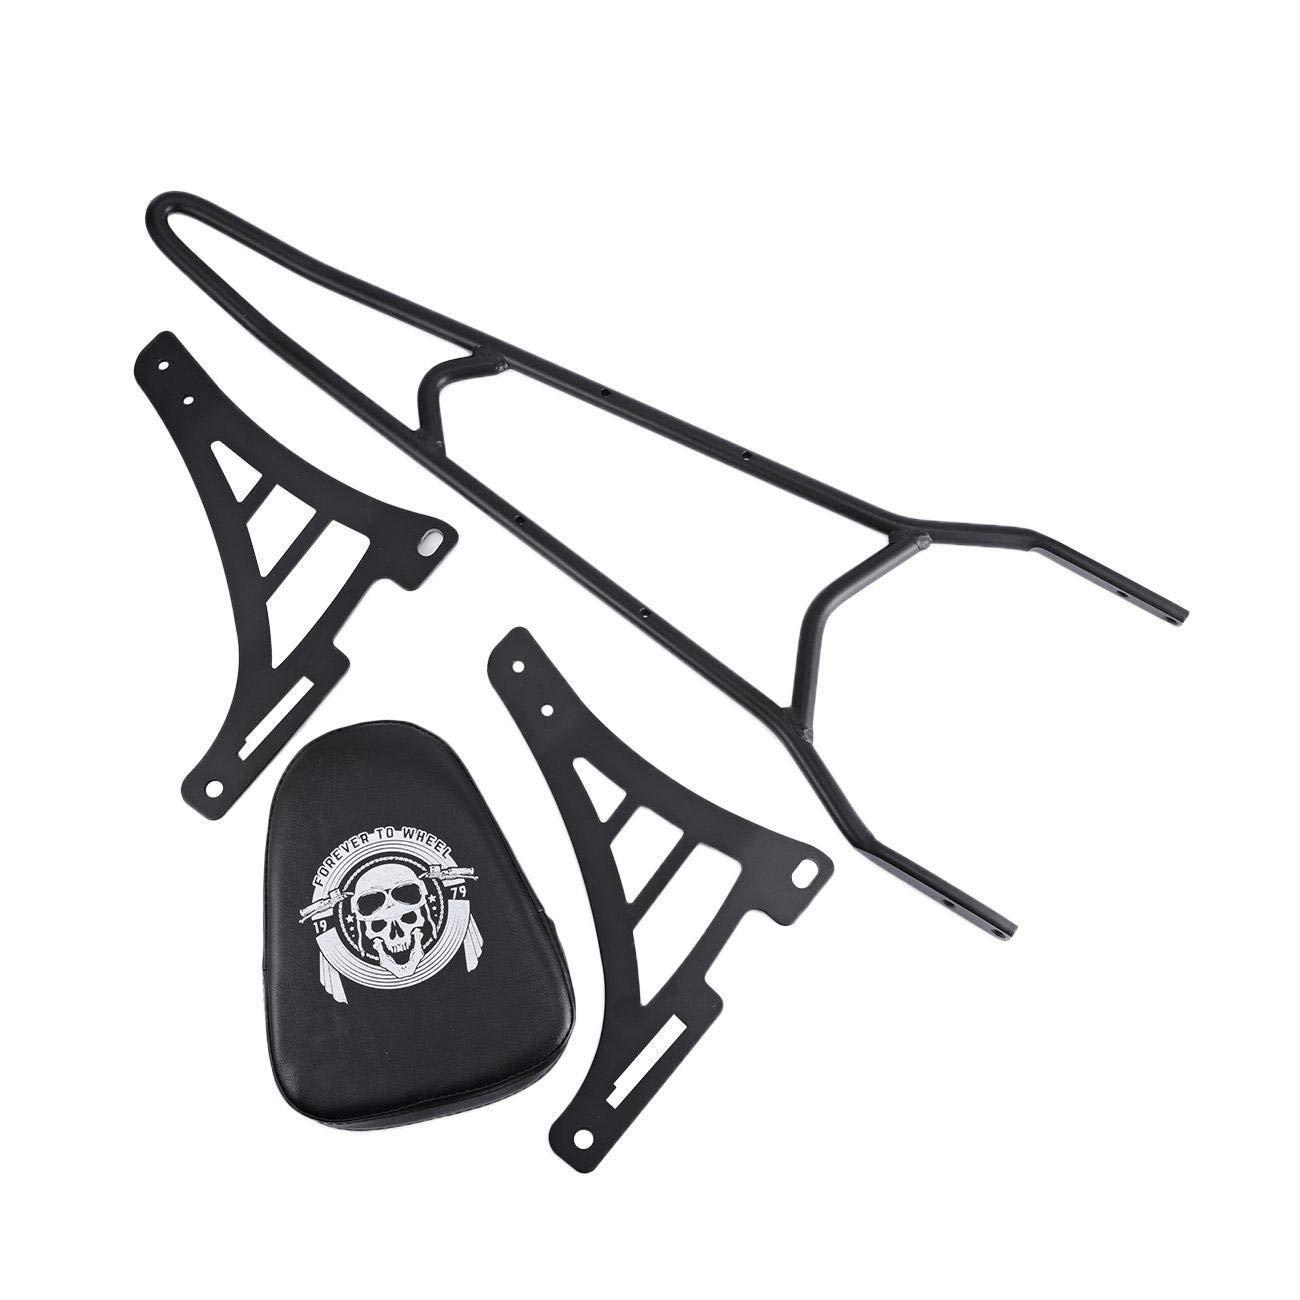 IRONWALLS Black Motorcycle Detachable Rear Backrest Sissy Bar for 2004-Up Harley Sportster XL 1200 883